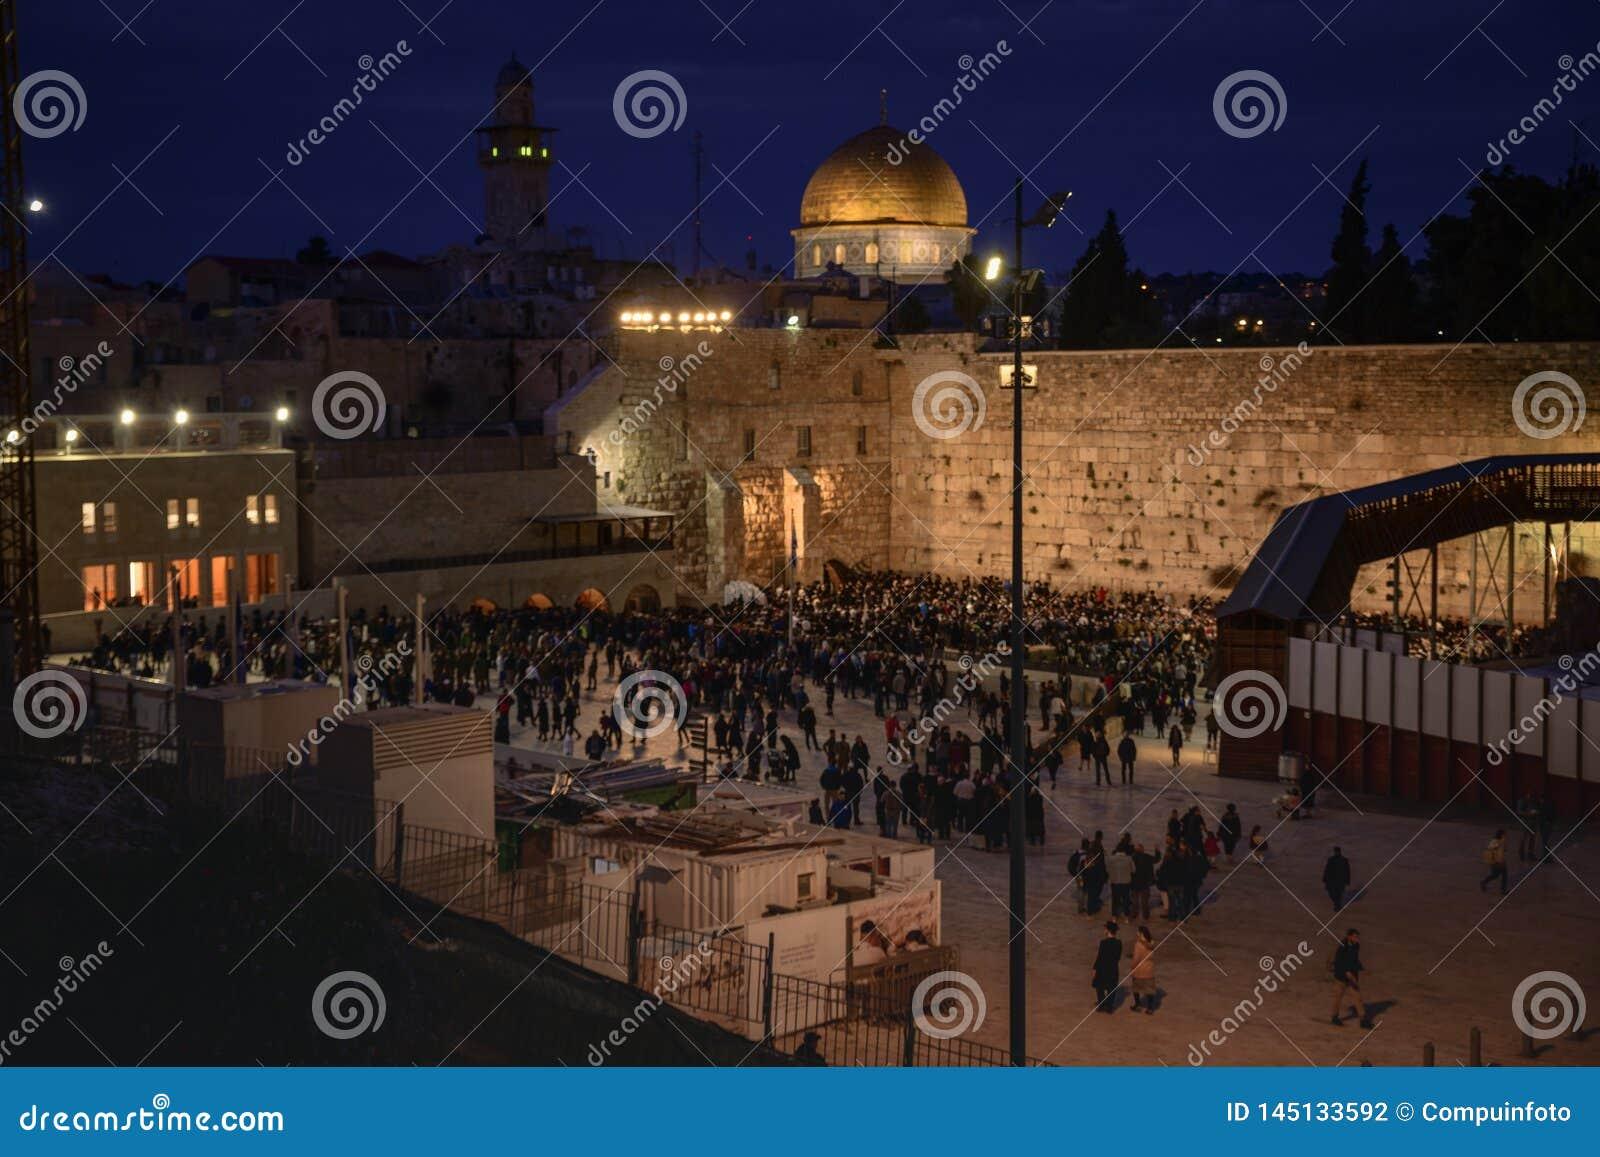 People at the western wall at sabbath evening